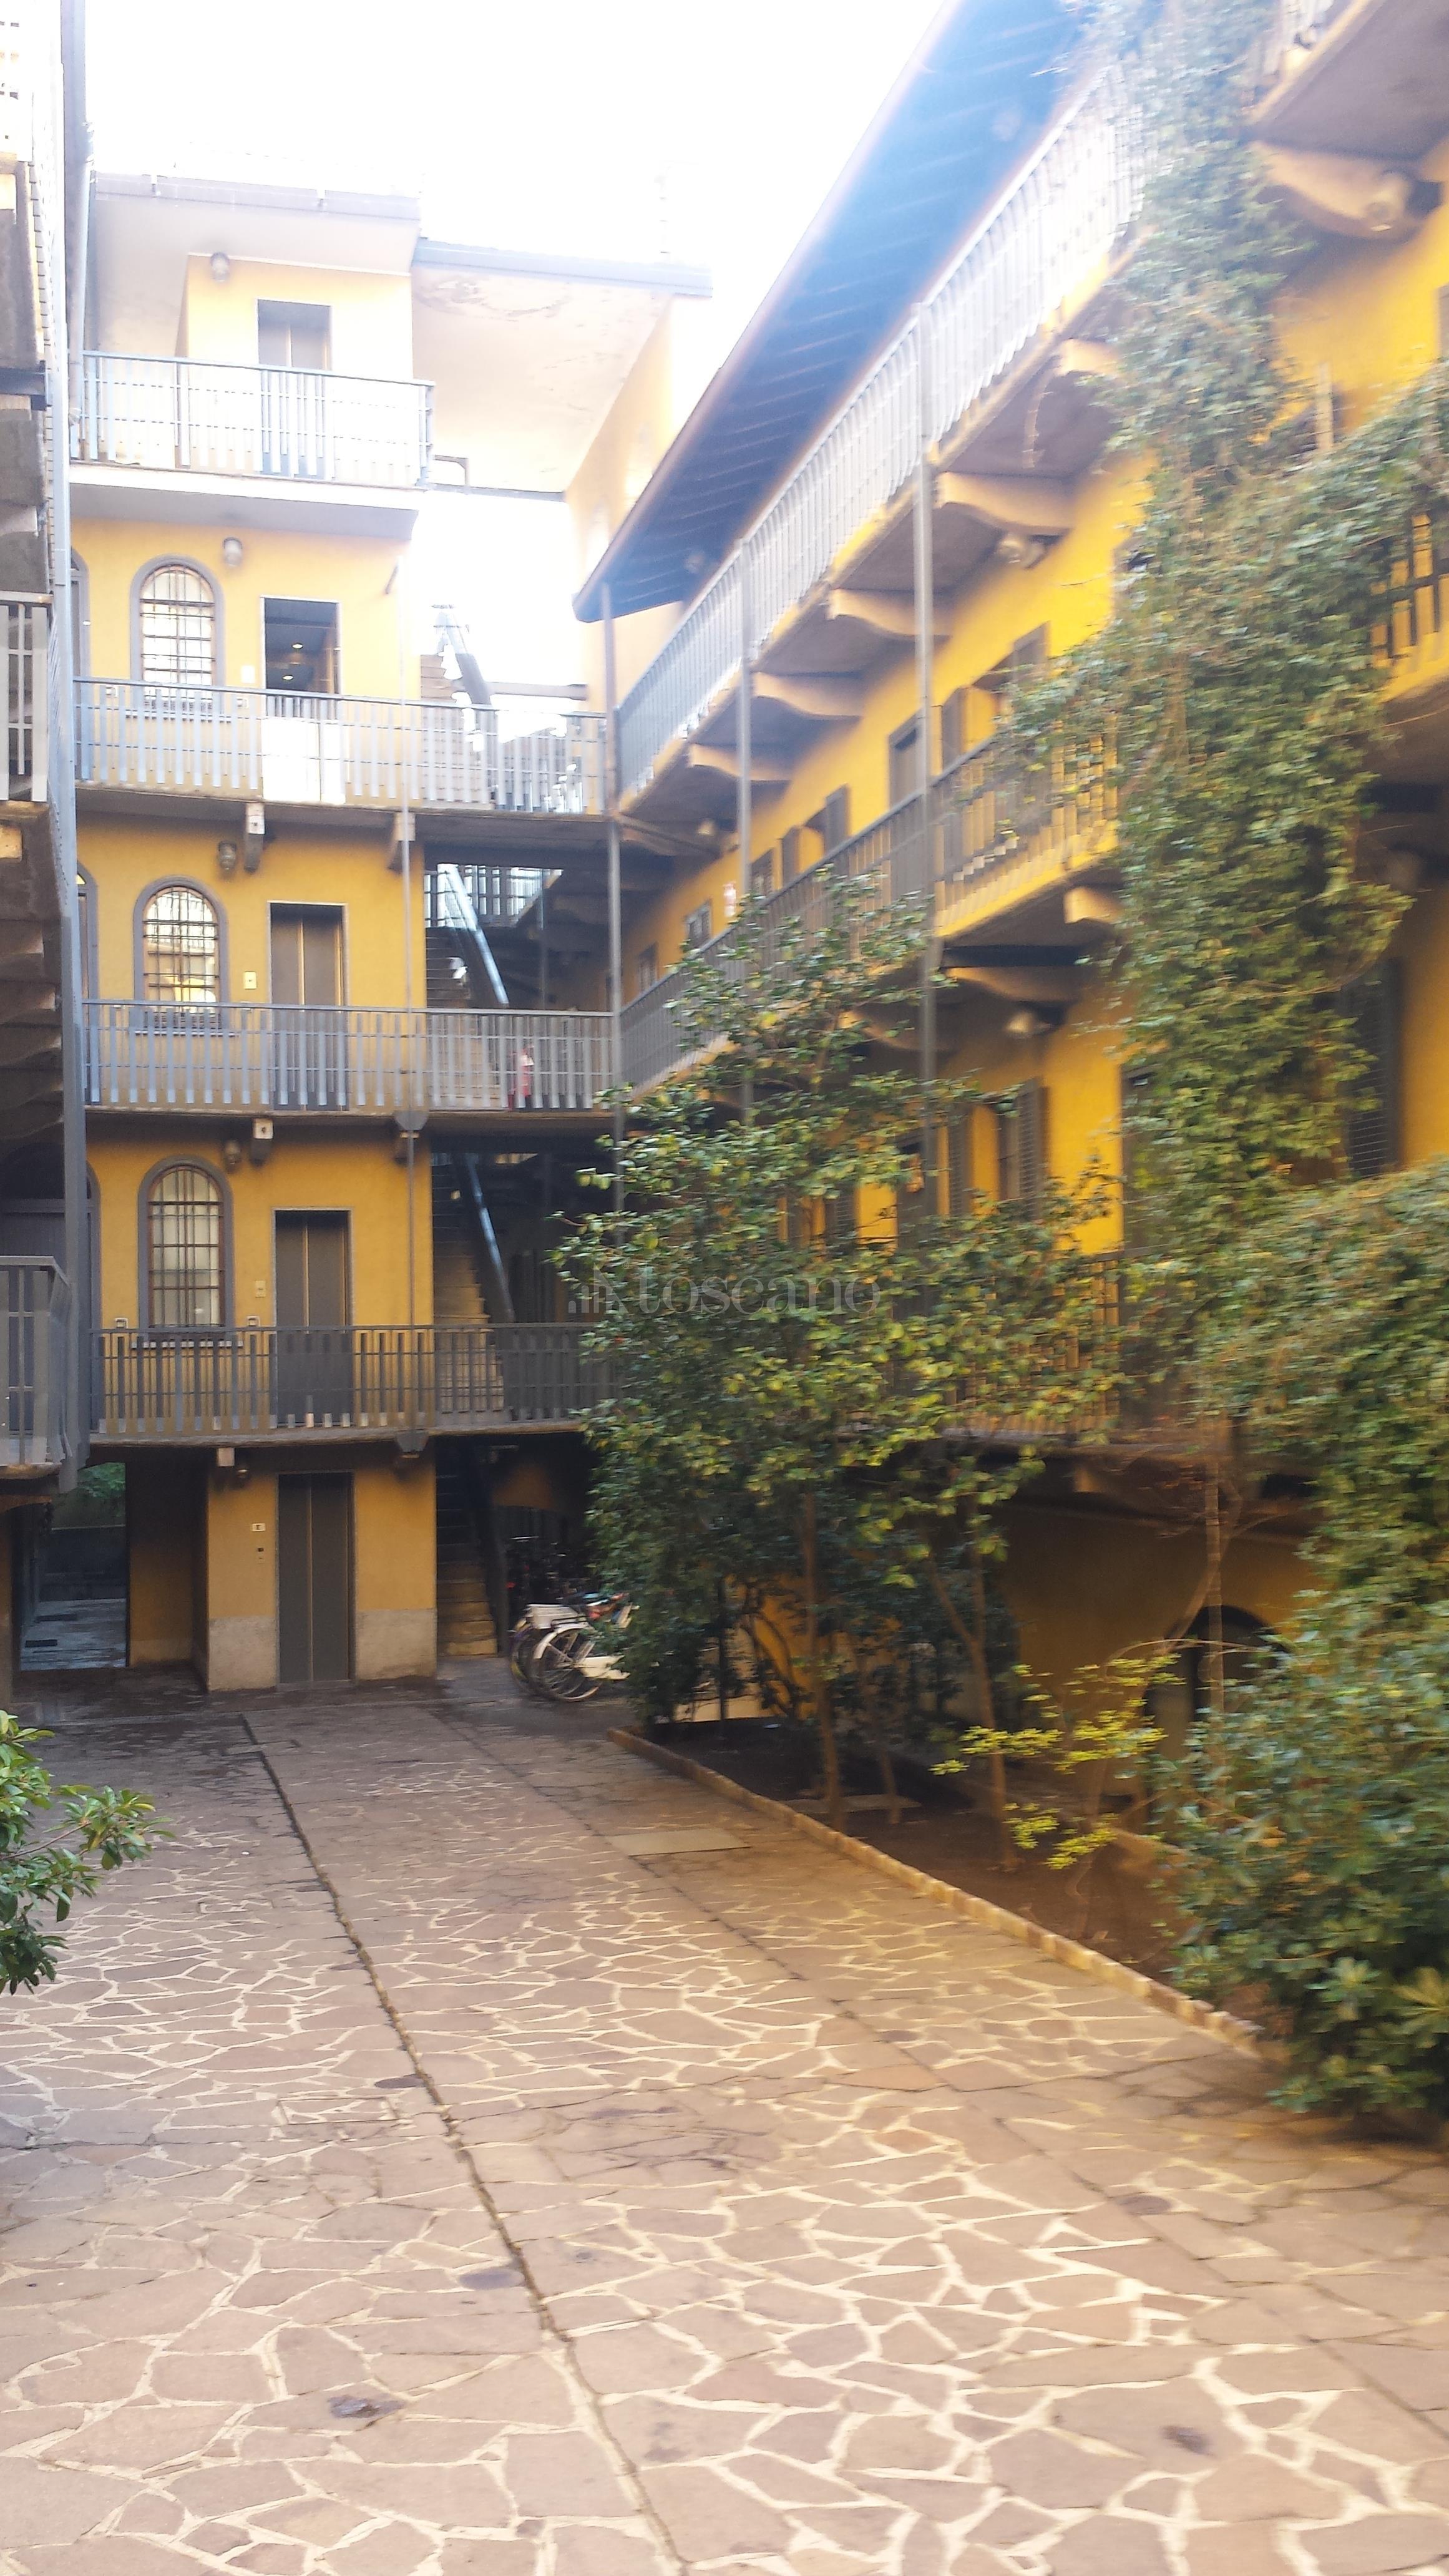 vendita Casa a Milano in Via Vigevano, Porta Genova 68/2017   Toscano